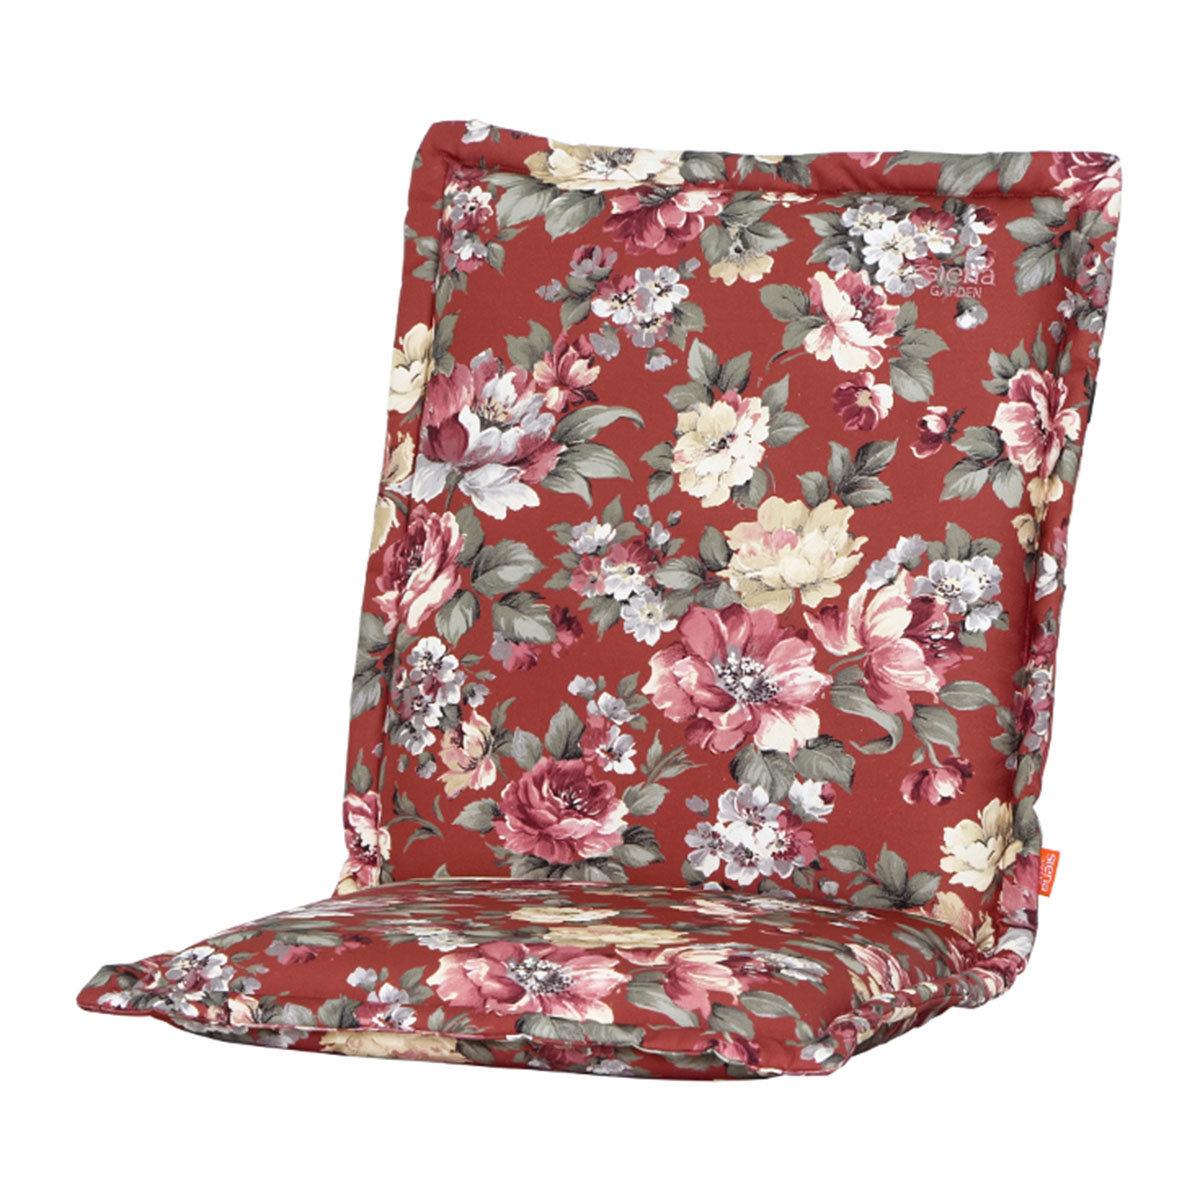 Sessel-Auflage Lissa, Blume-terrakotta